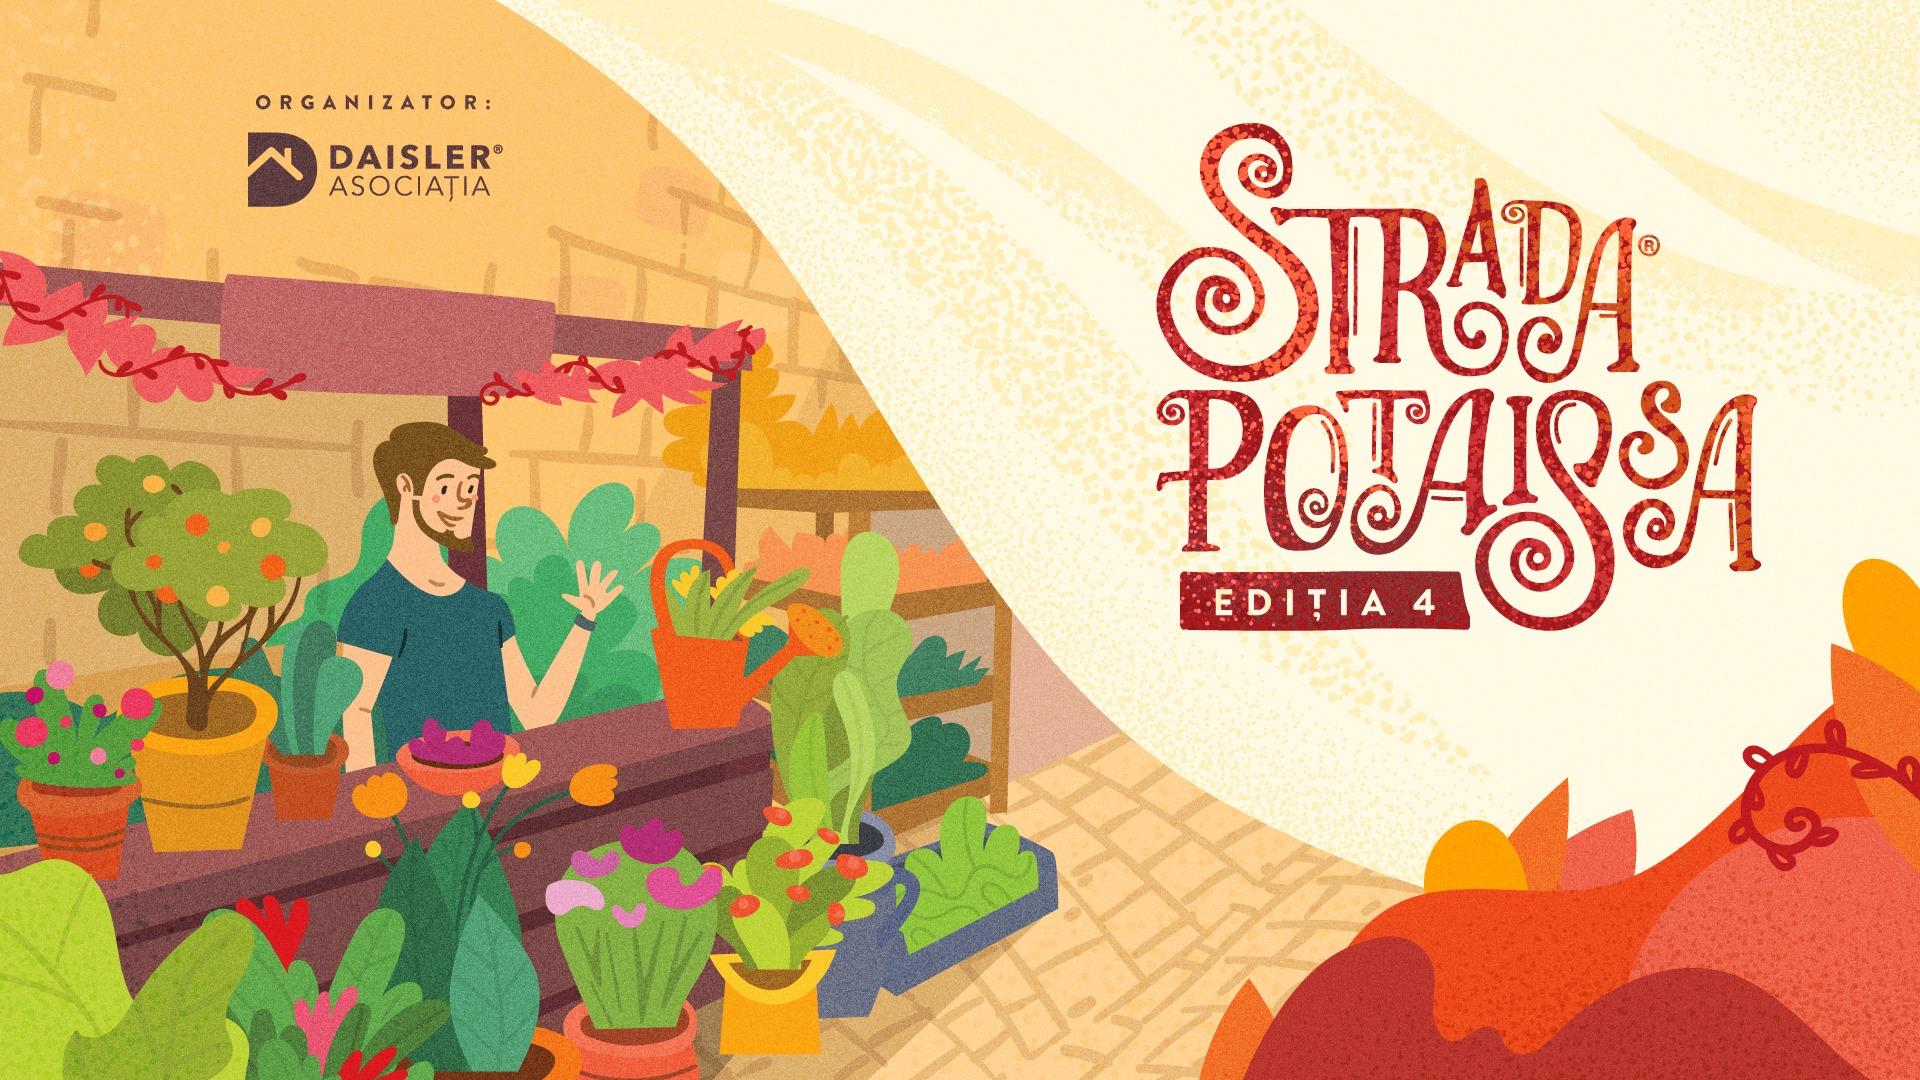 Strada Potaissa – Piața de flori altfel